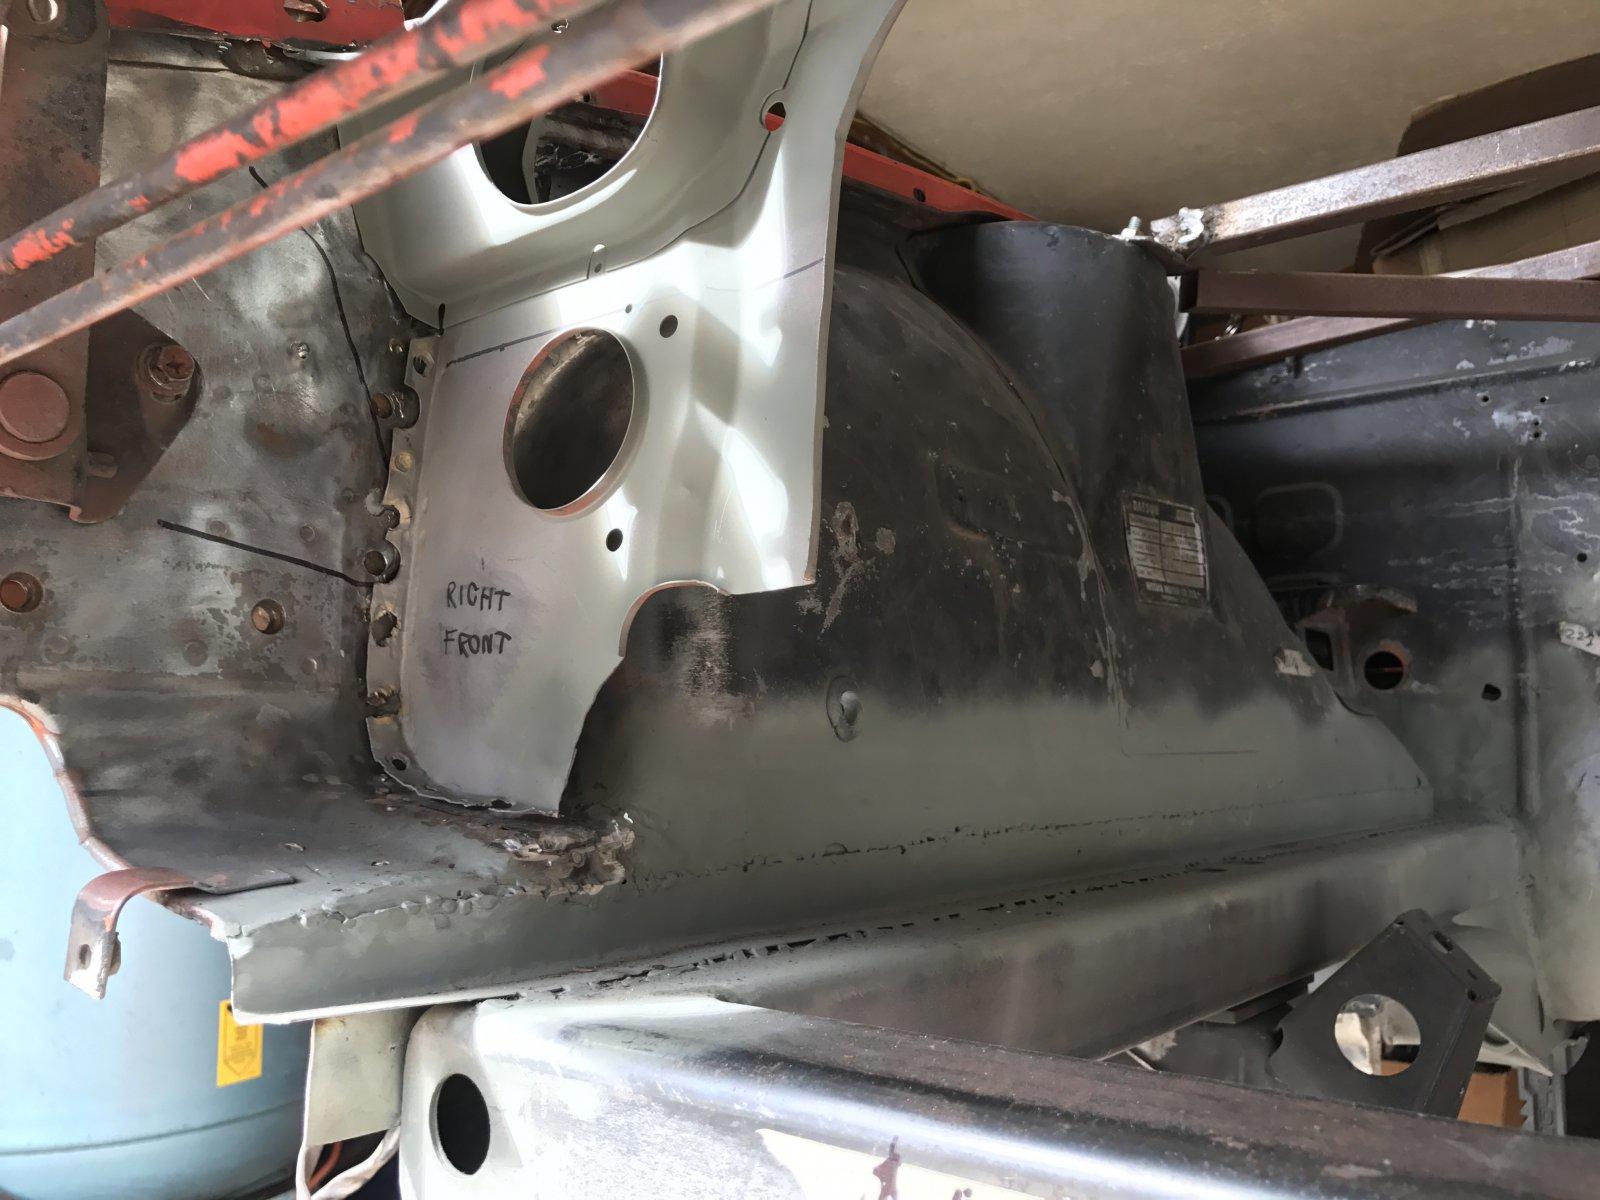 IMG_1777.JPG  Right side radiator support cut away